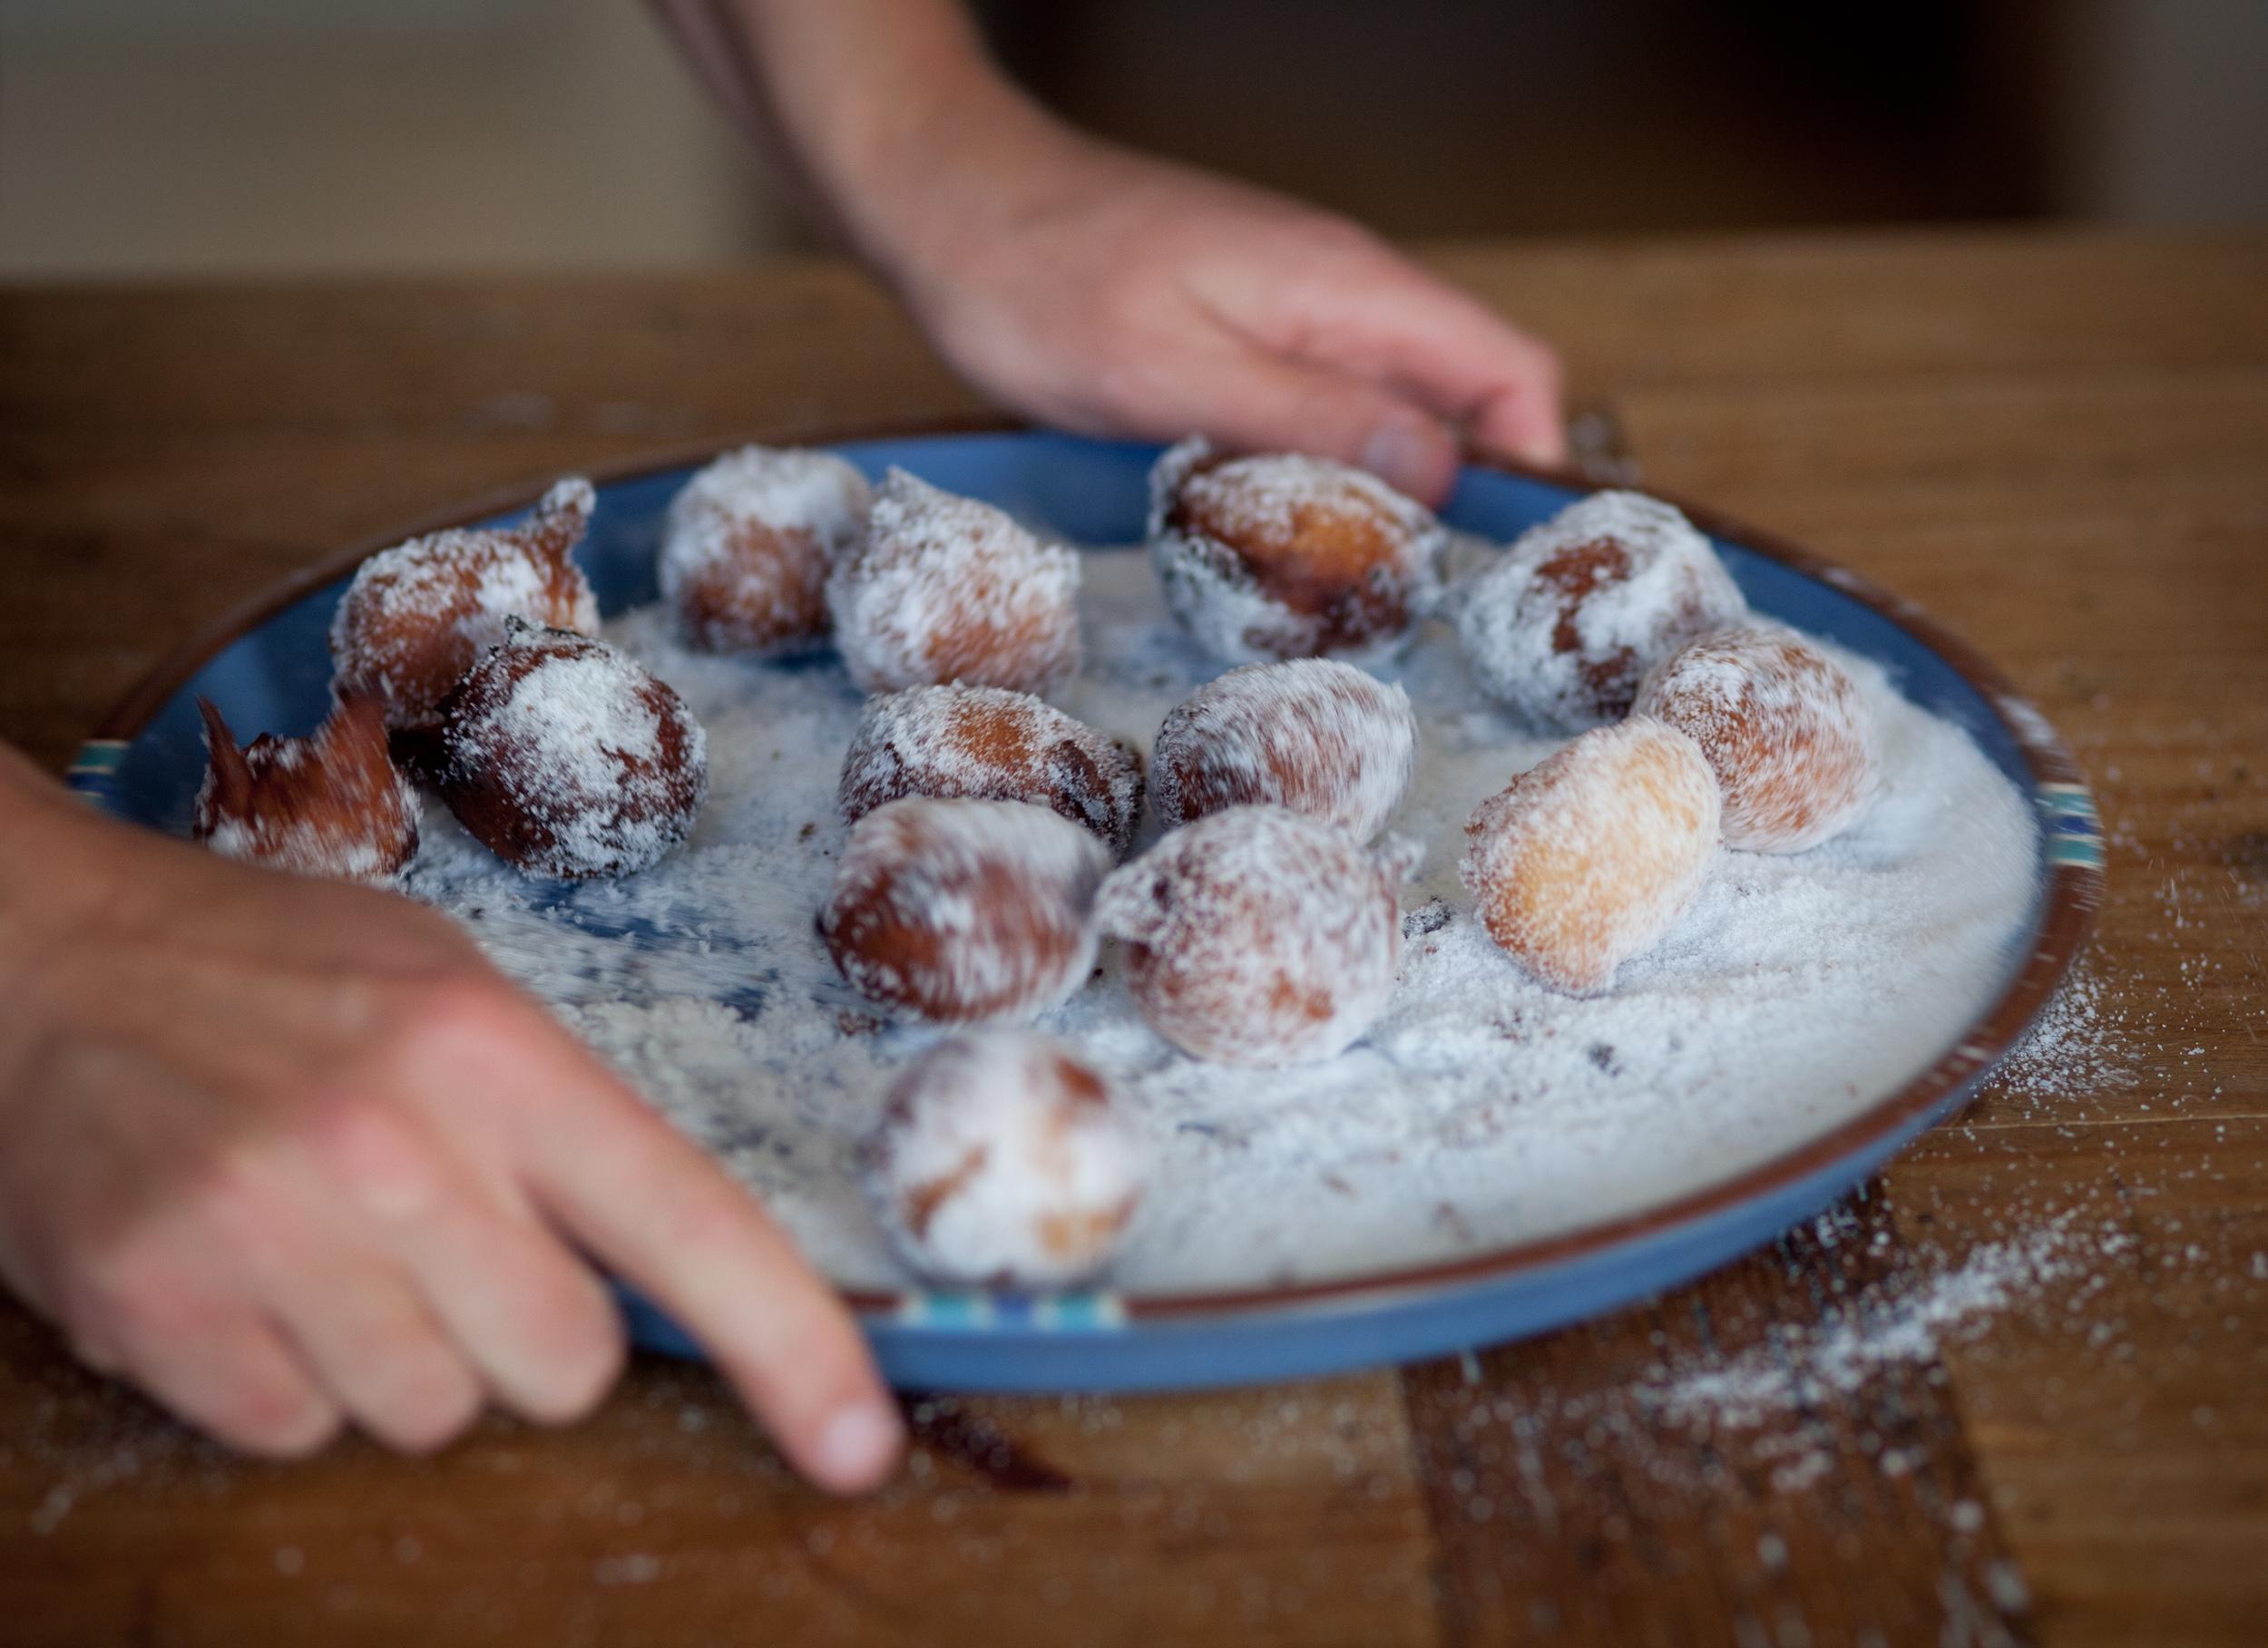 Rolling the doughnut balls in sugar